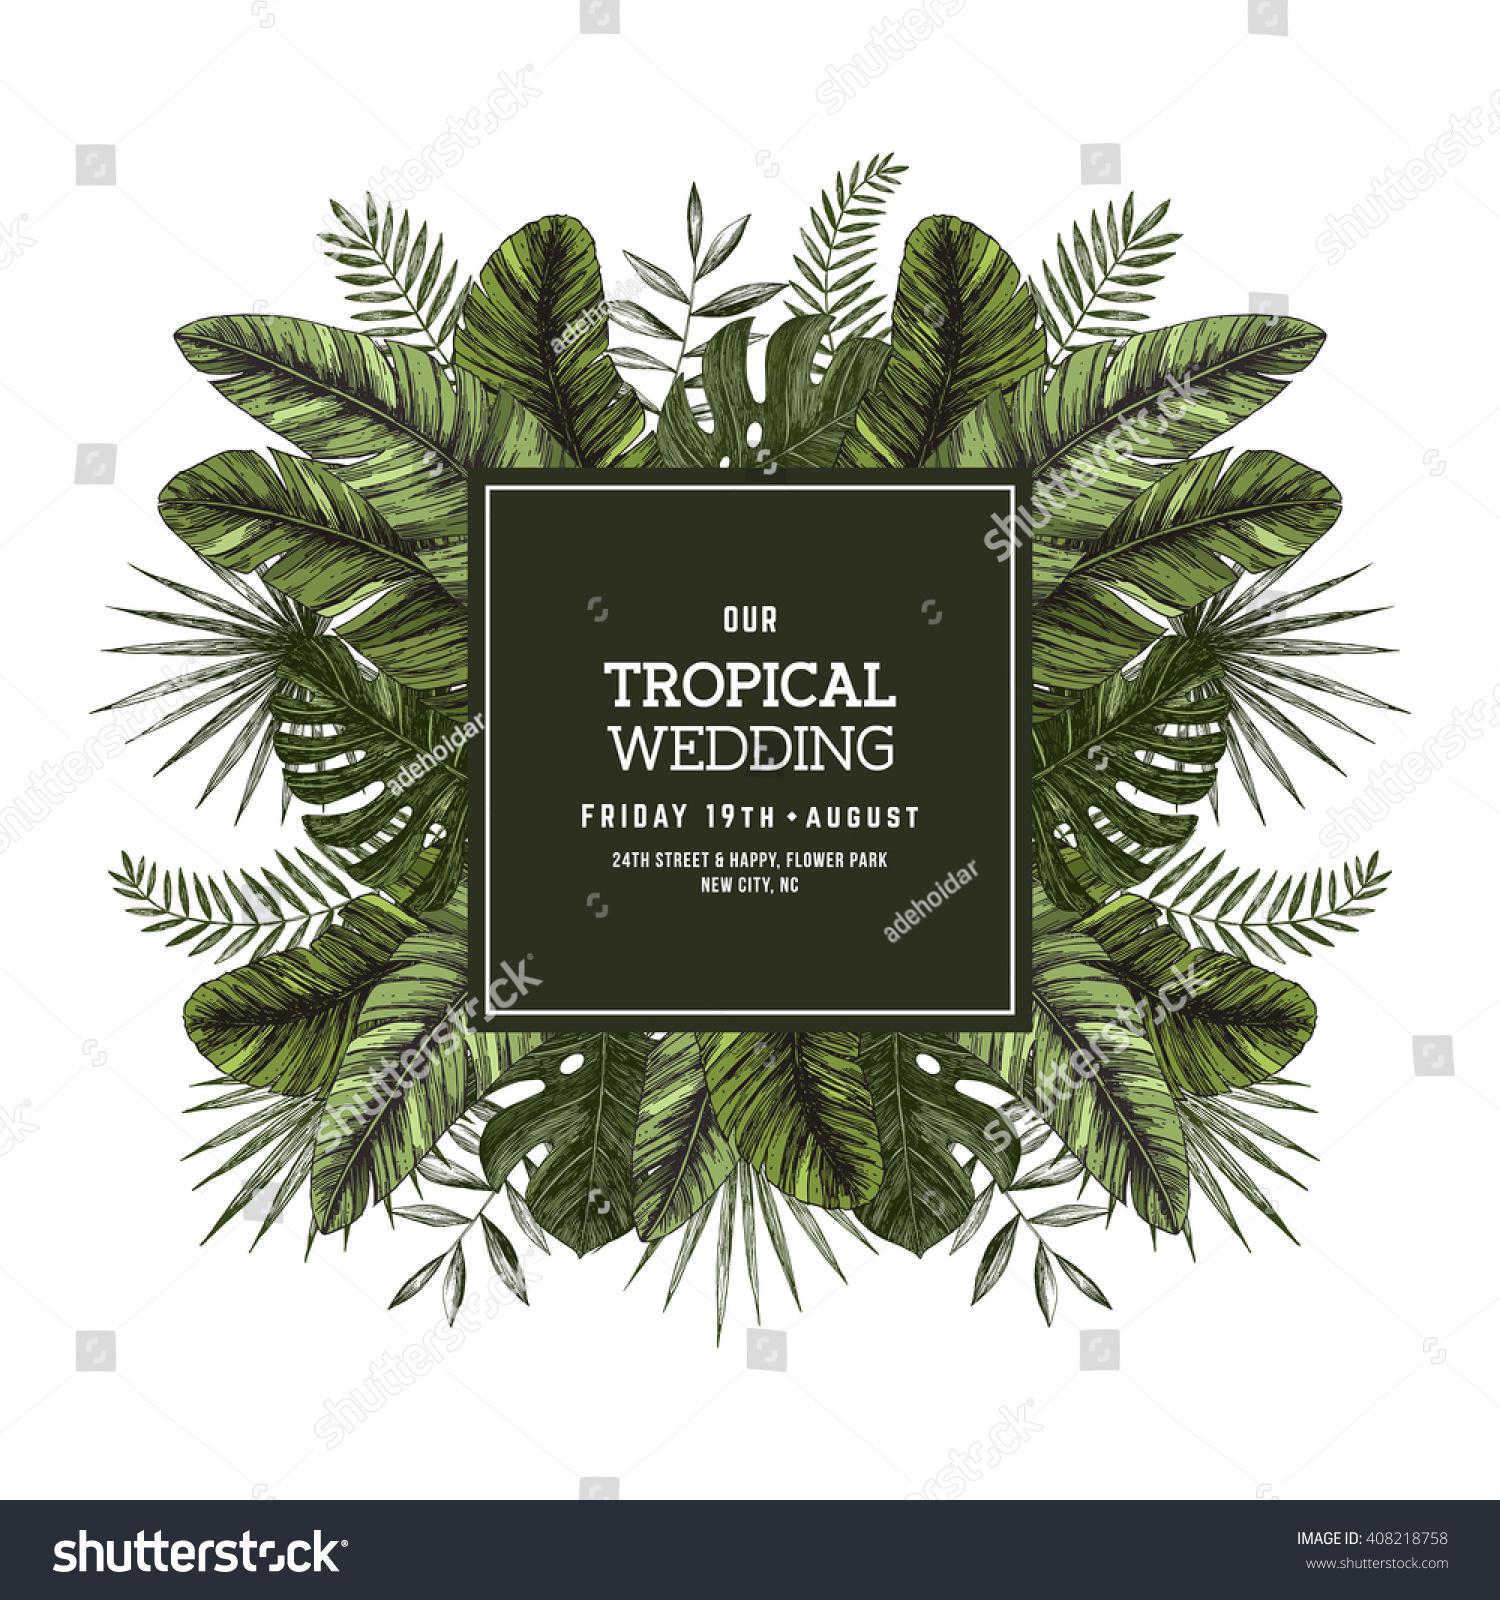 Tropical palm leaves wedding invitation template stock for Tropical wedding invitations